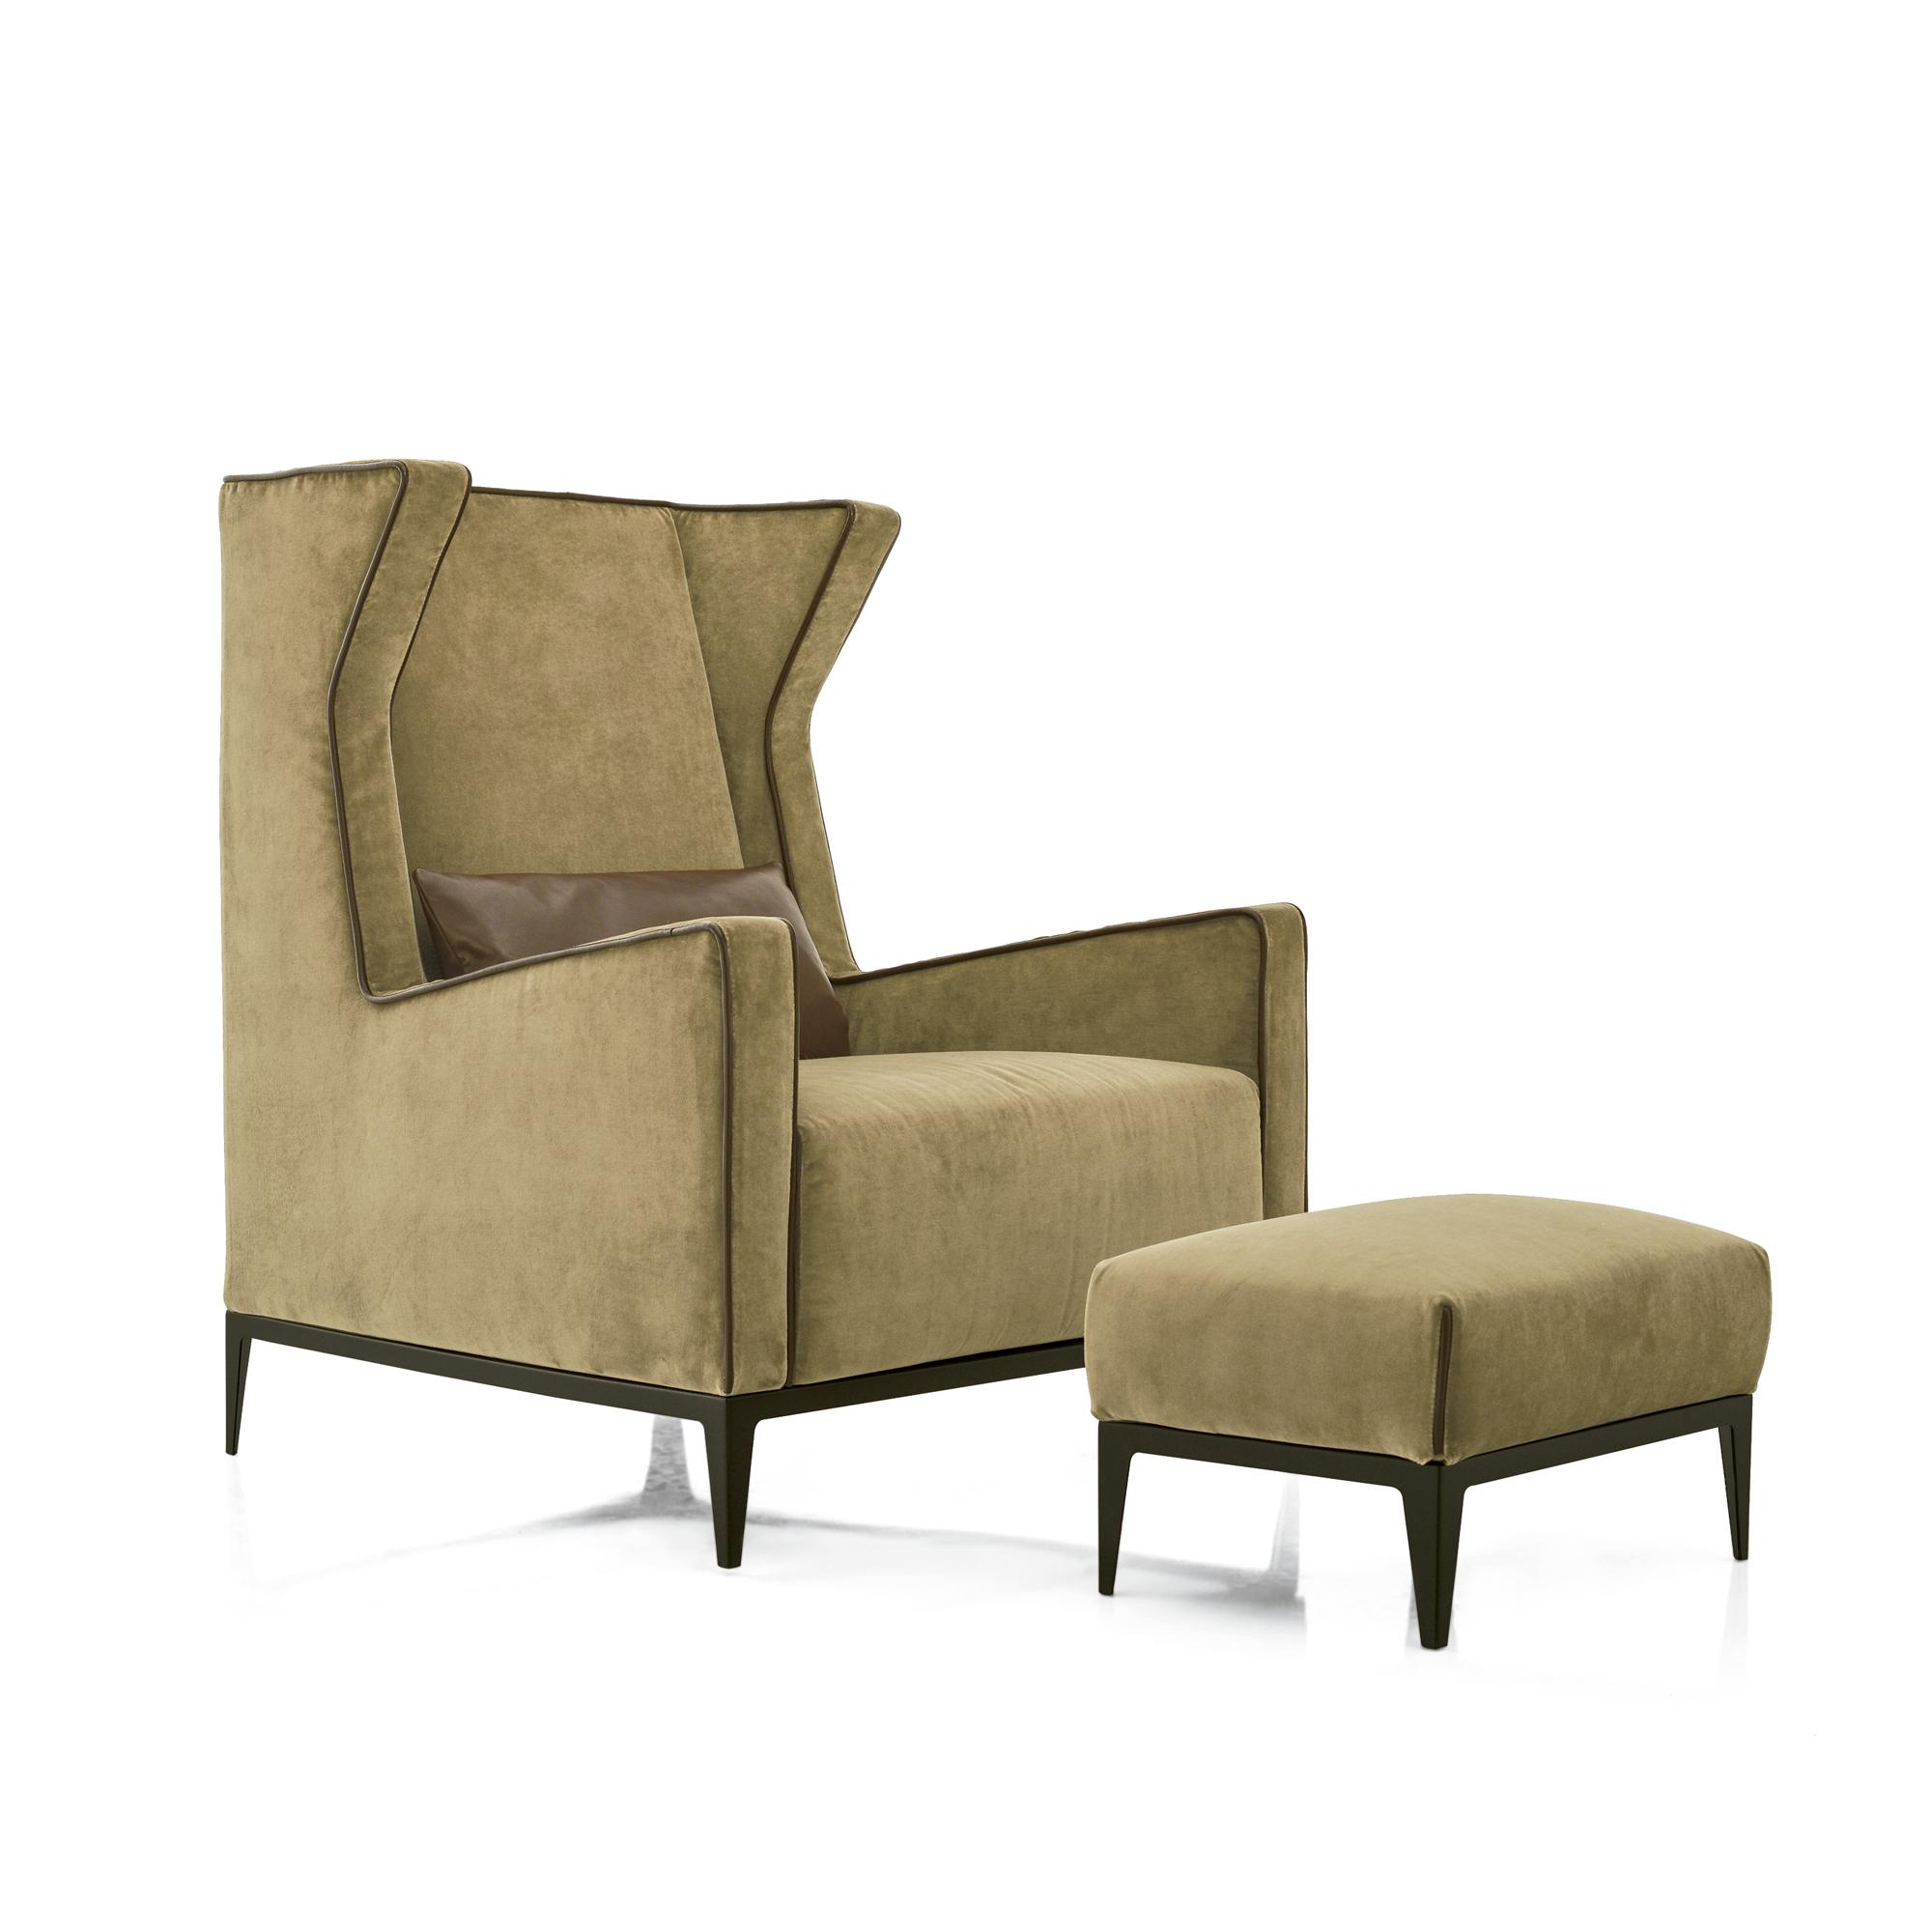 Luxury Italian Goldfinger Lounge Chair Italian Designer